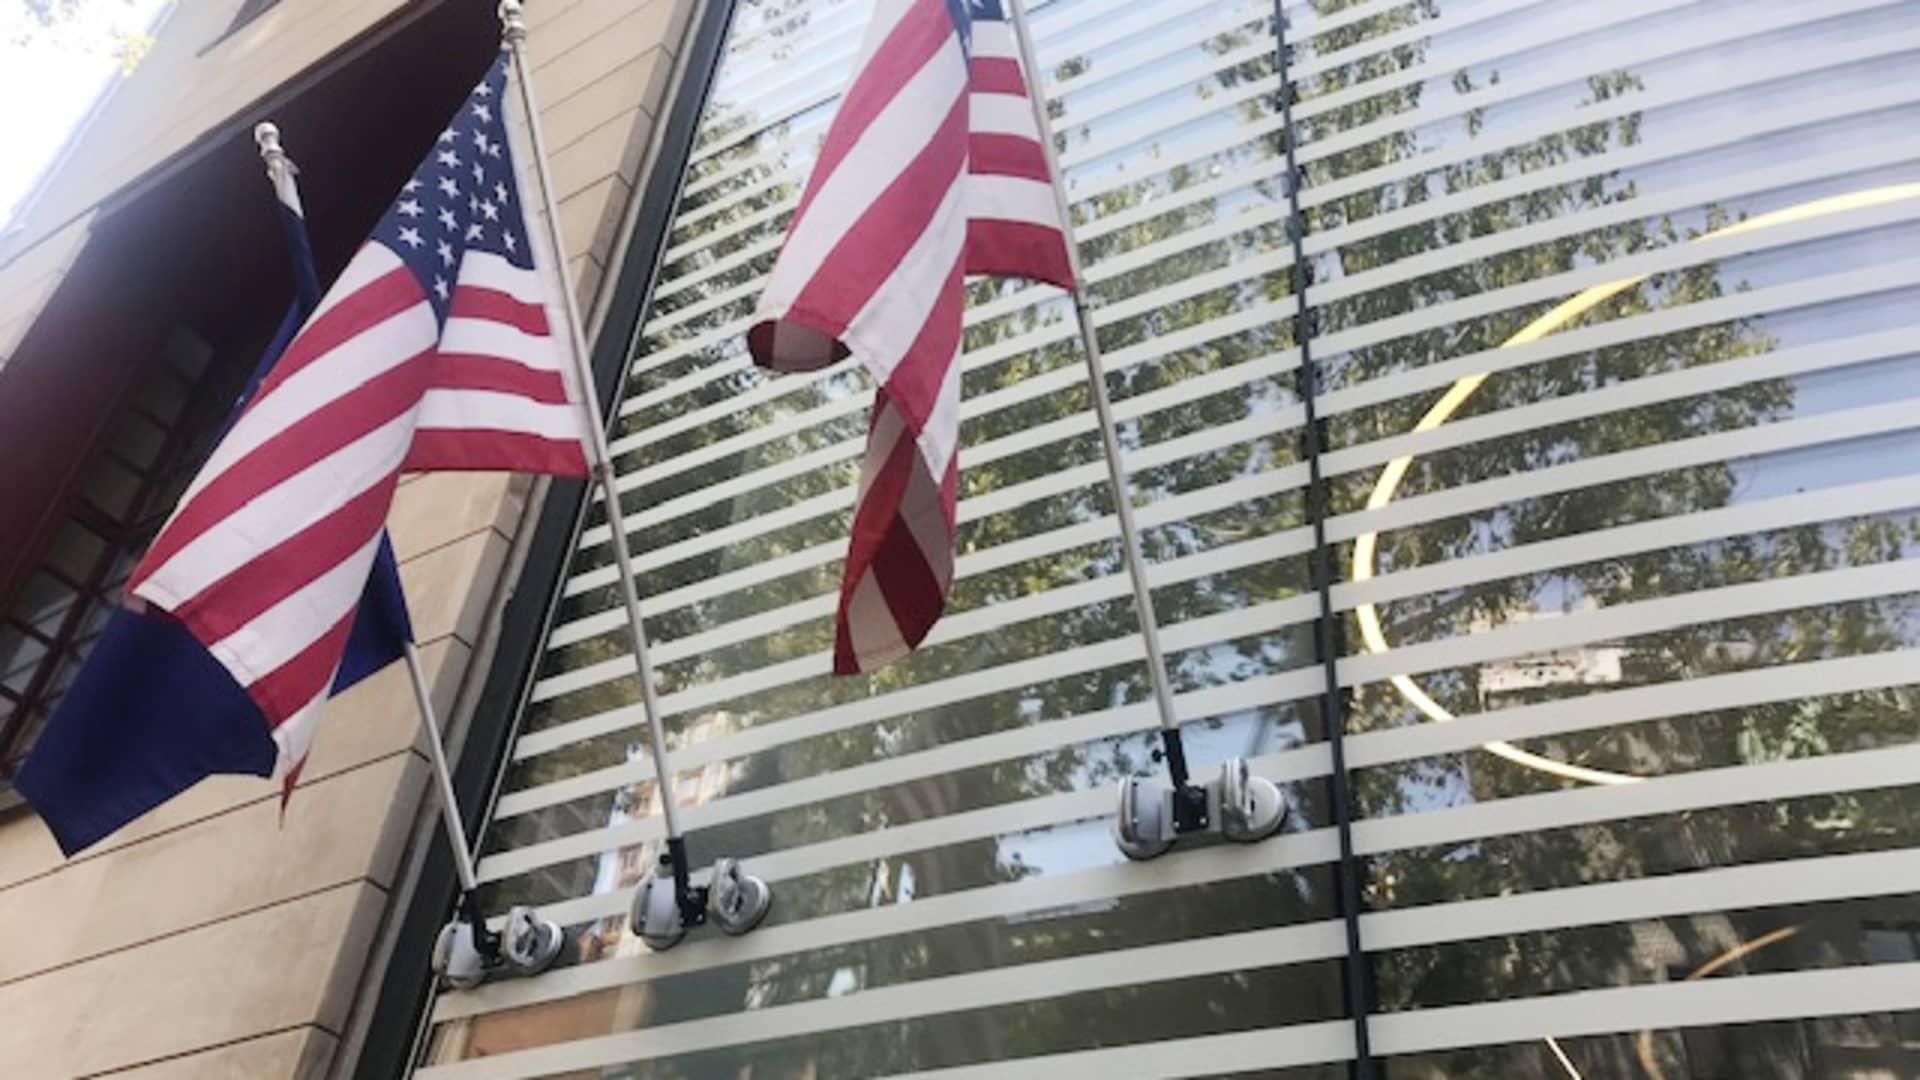 Exterior of the Himalaya Embassy in New York.